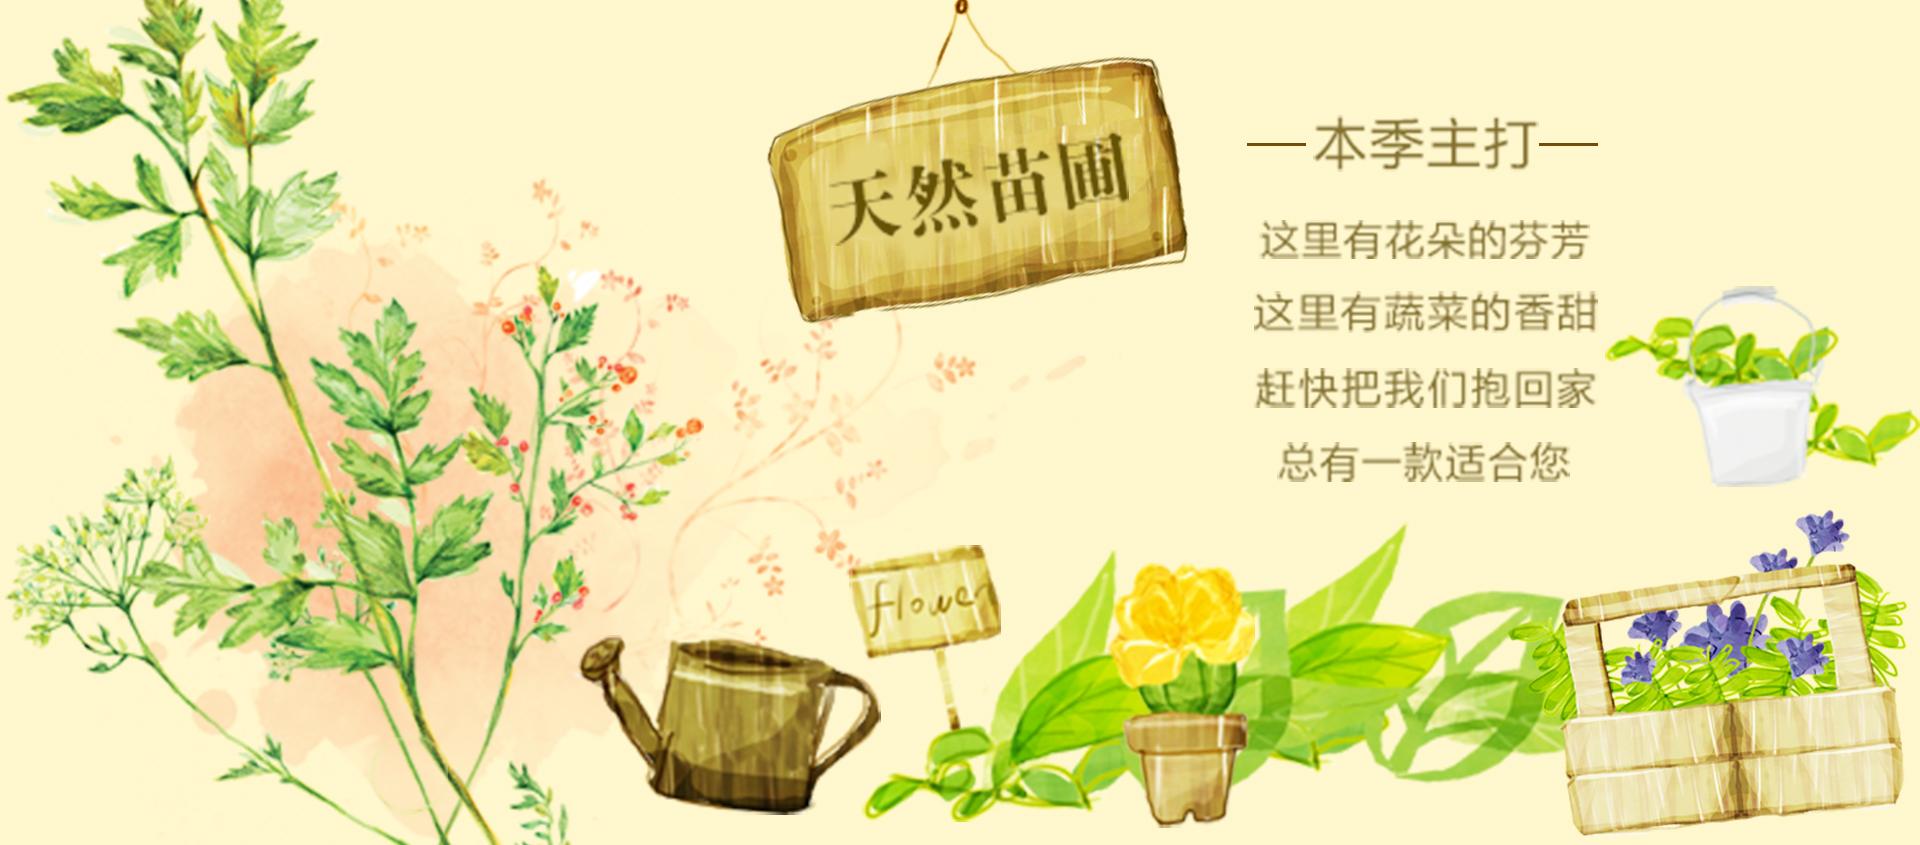 Cabeza figura Jardineria Taobao banner Cabeza Figura Gratis ...